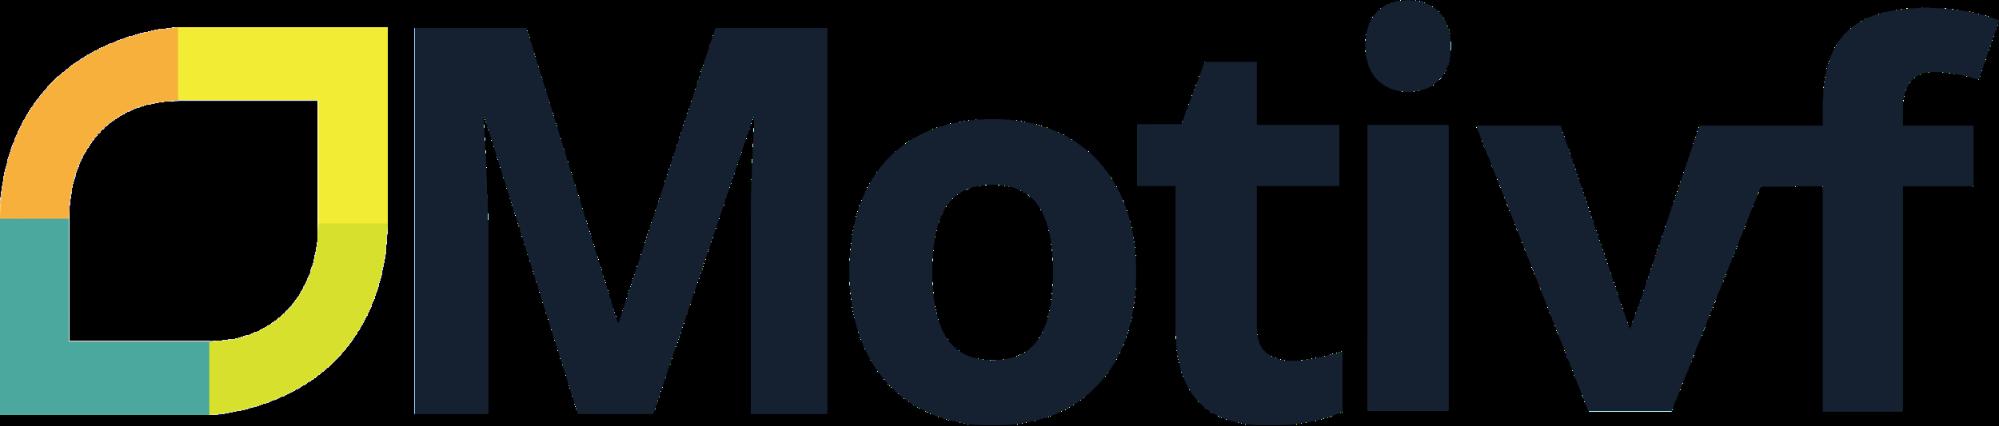 2. Logo type with mark, 4. Mark with Dark Cobalt Blue logo type